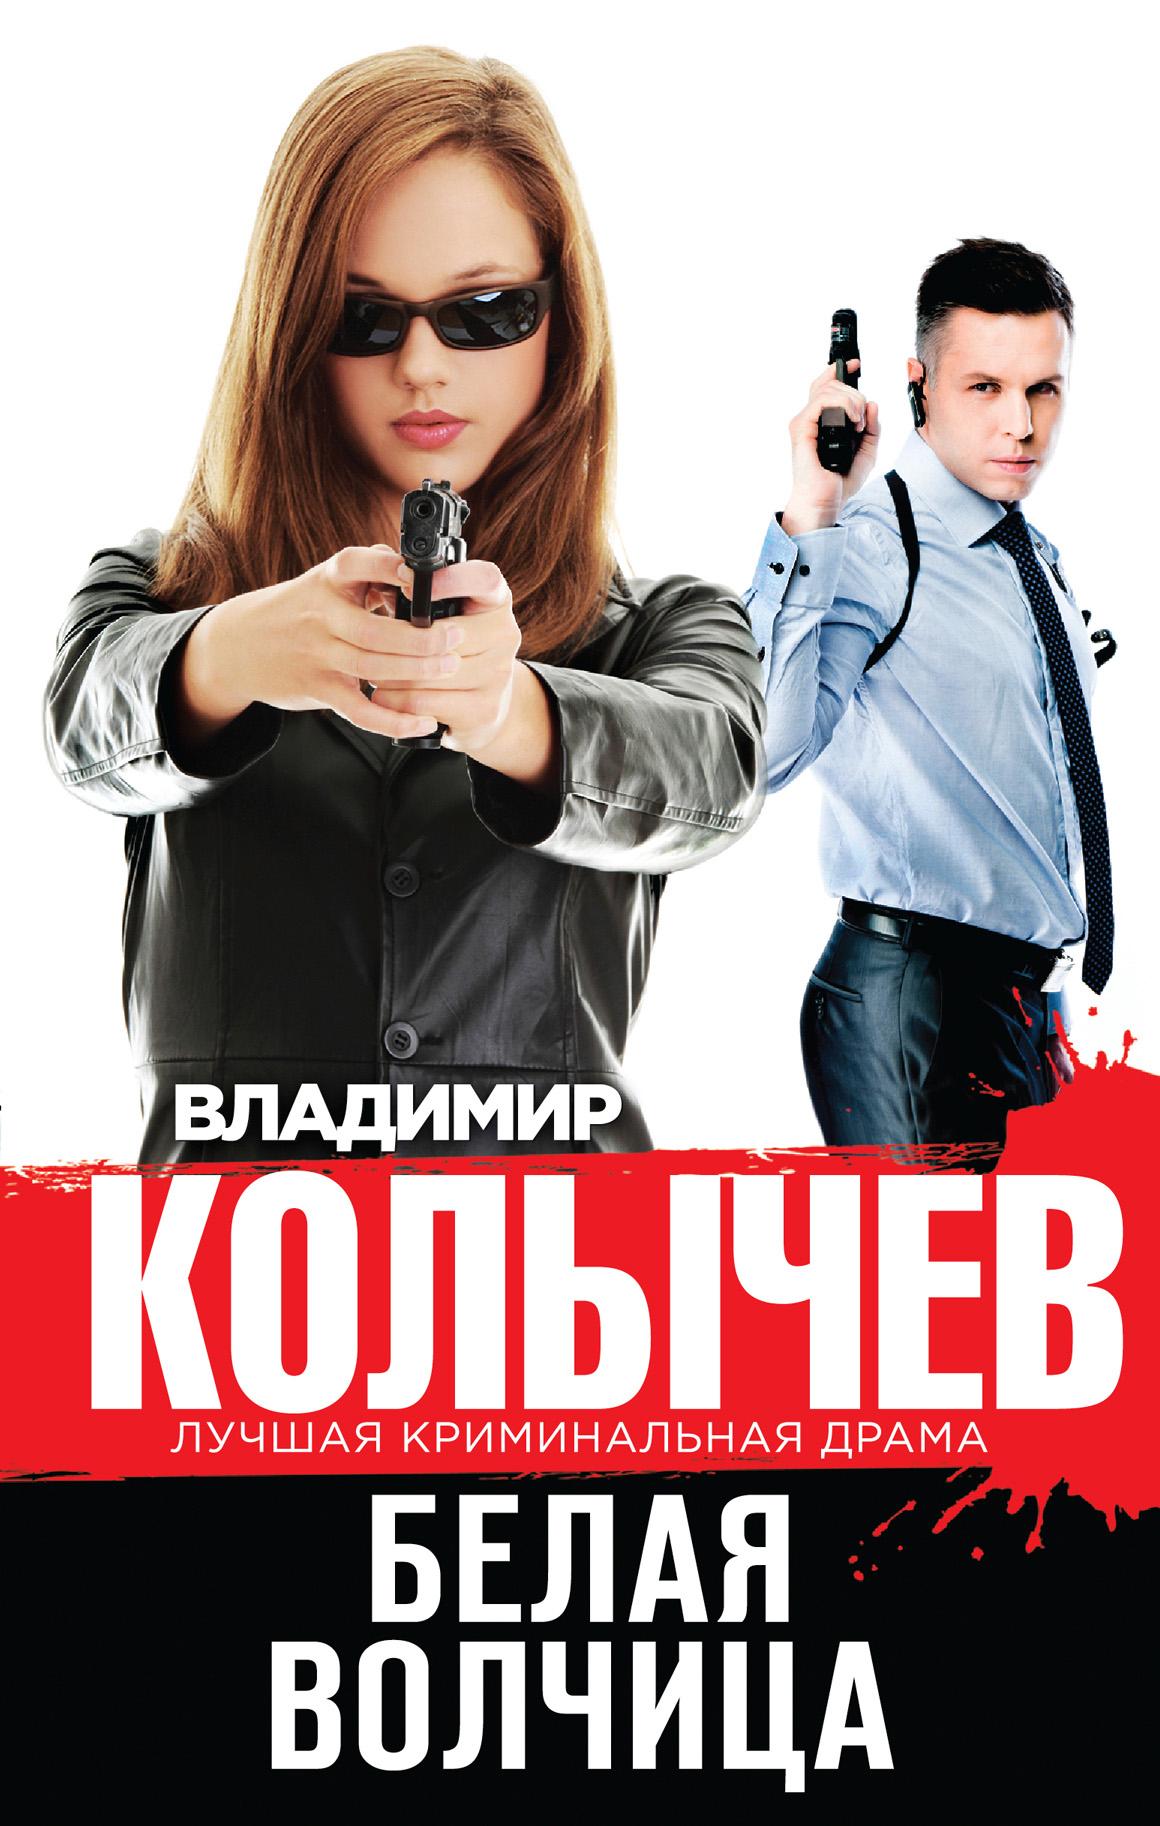 belaya volchitsa